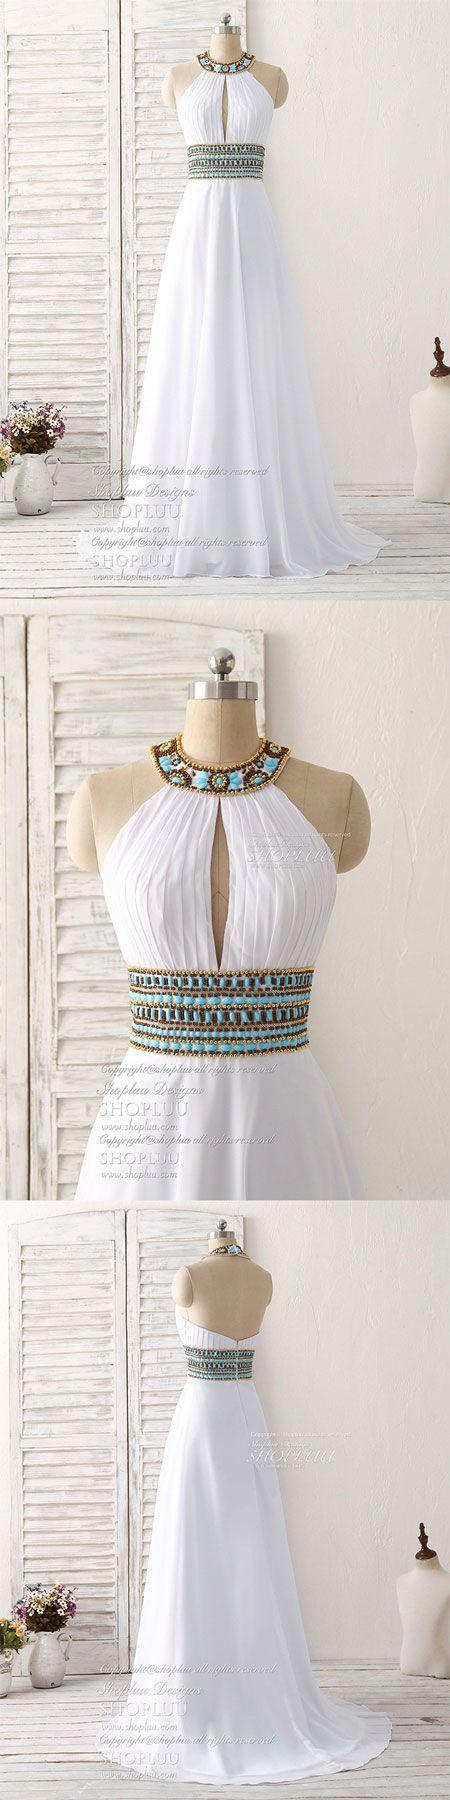 White chiffon beads long prom dress, white evening dress #EveningDresses